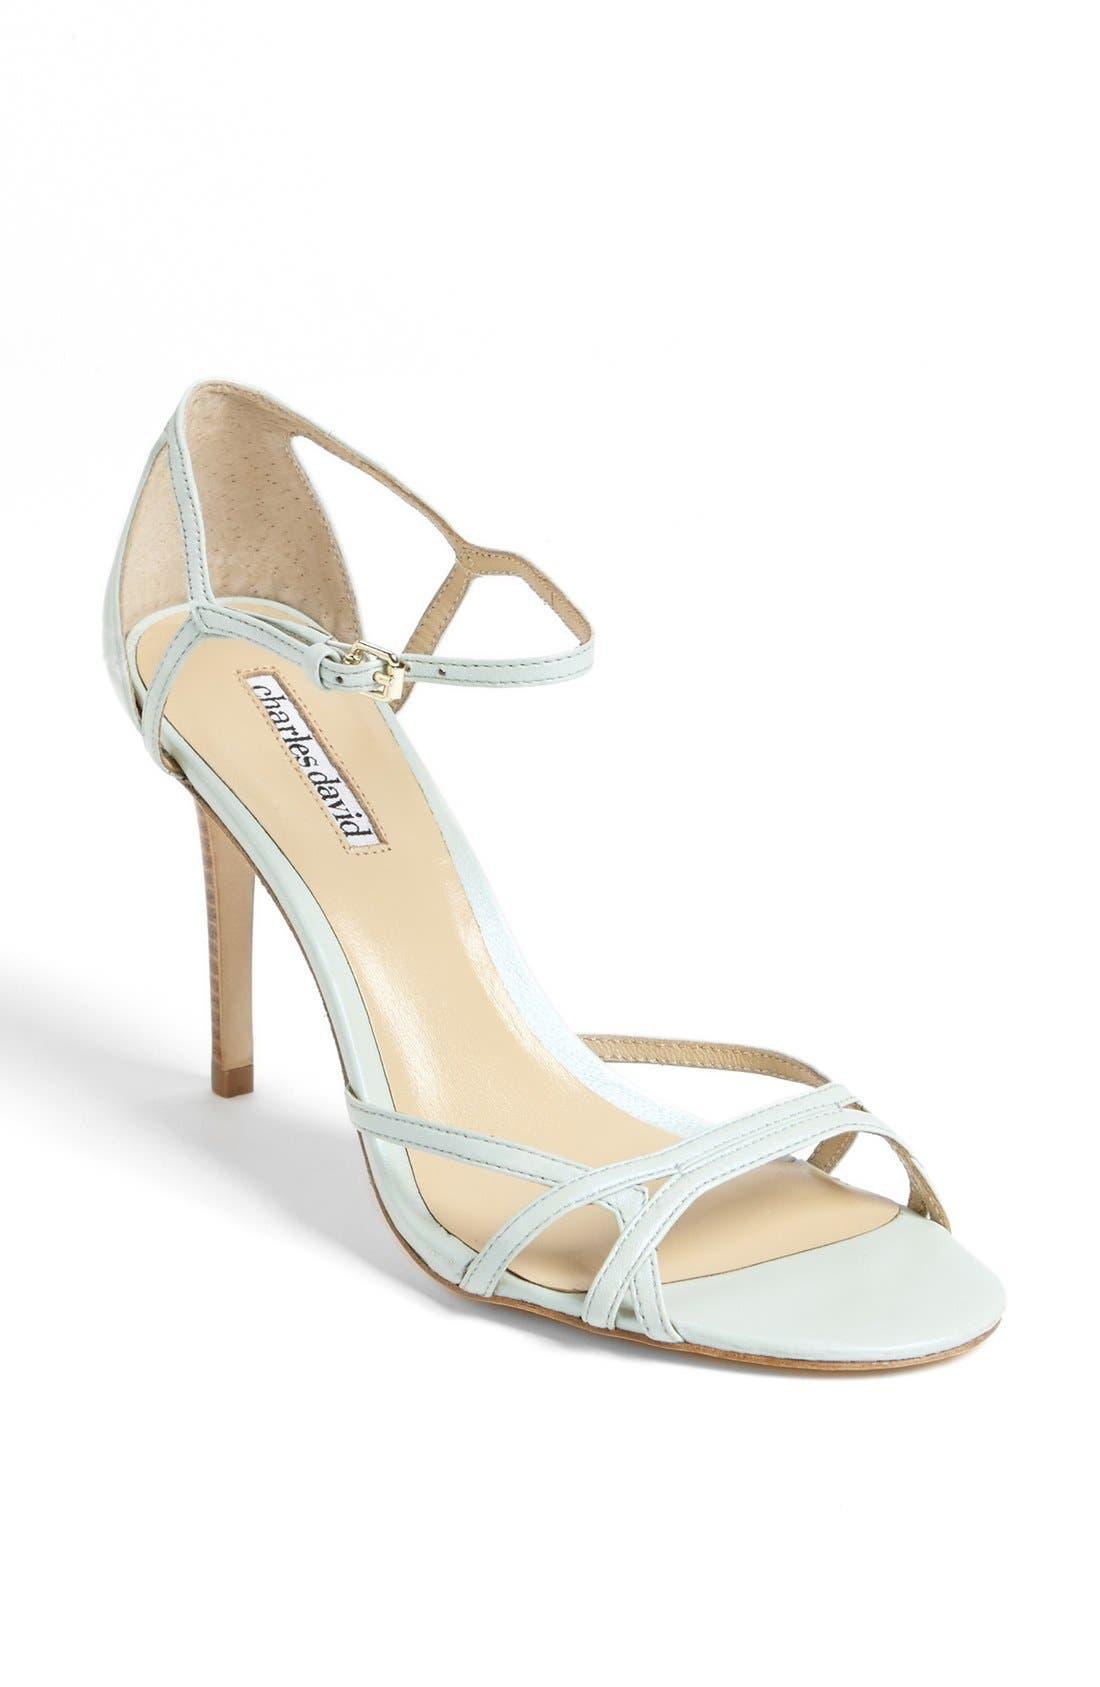 Alternate Image 1 Selected - Charles David 'Ionela' Sandal